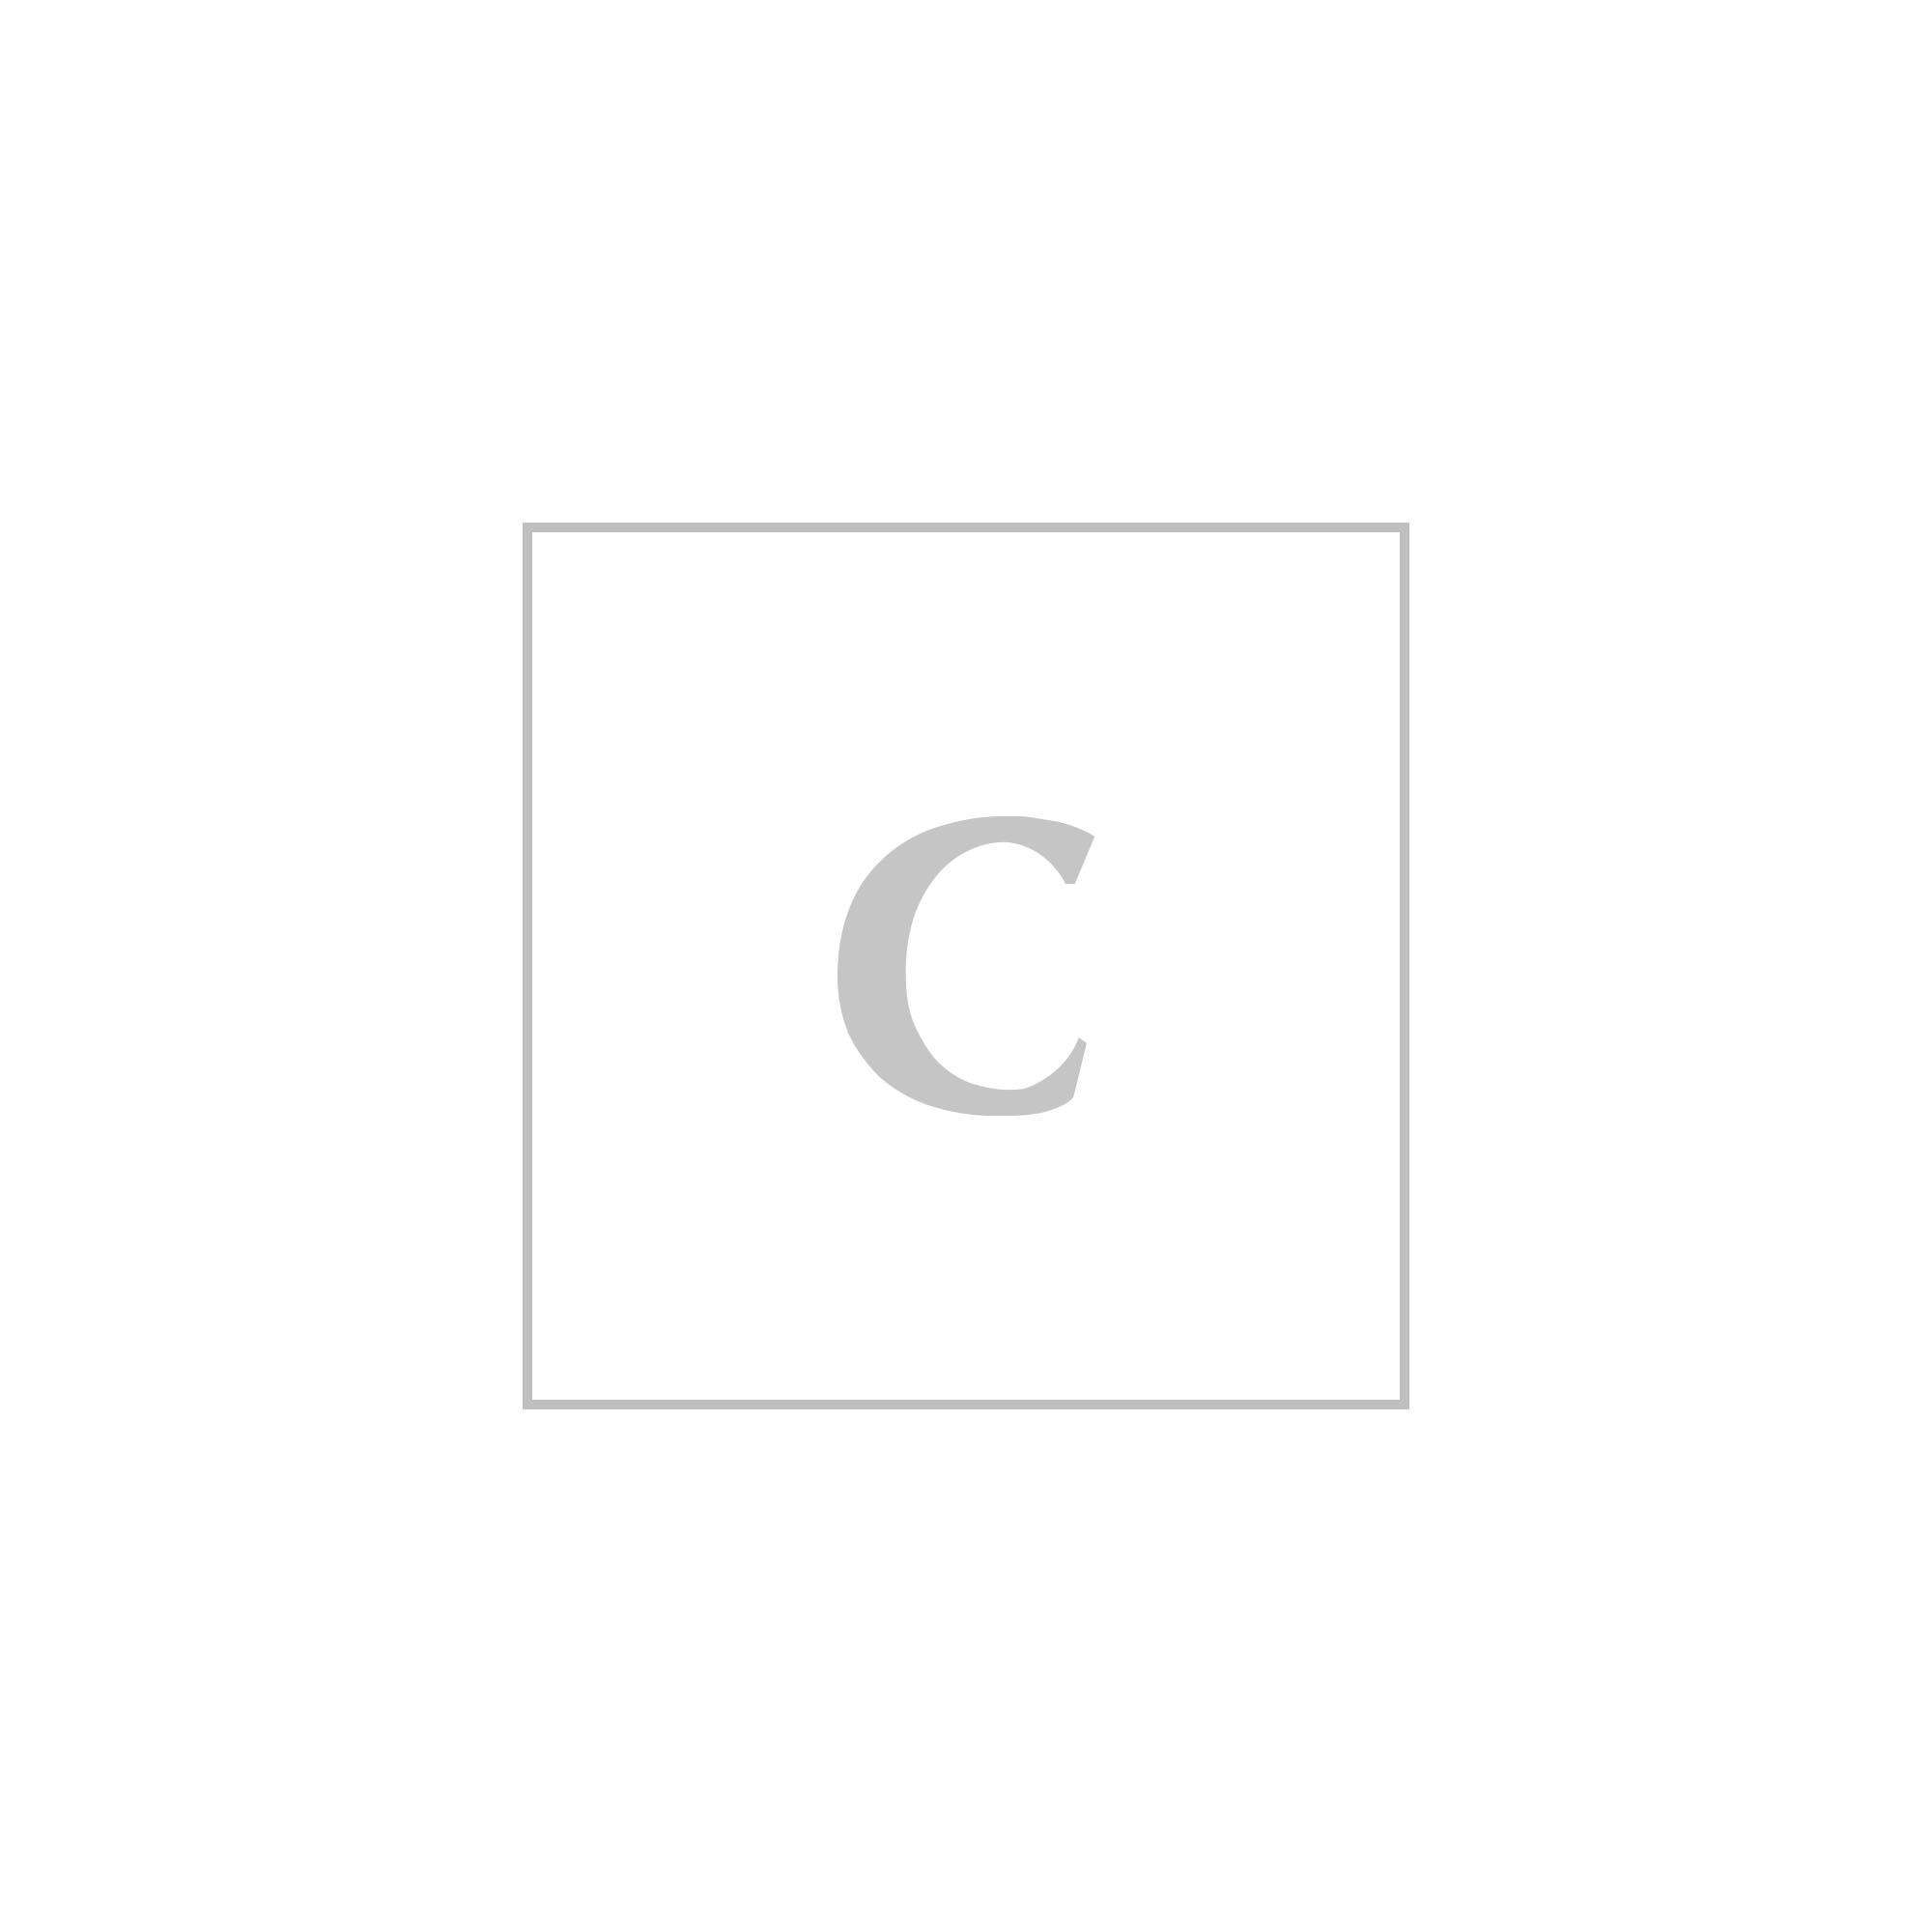 Fendi dynamic geometry cashmere pullover